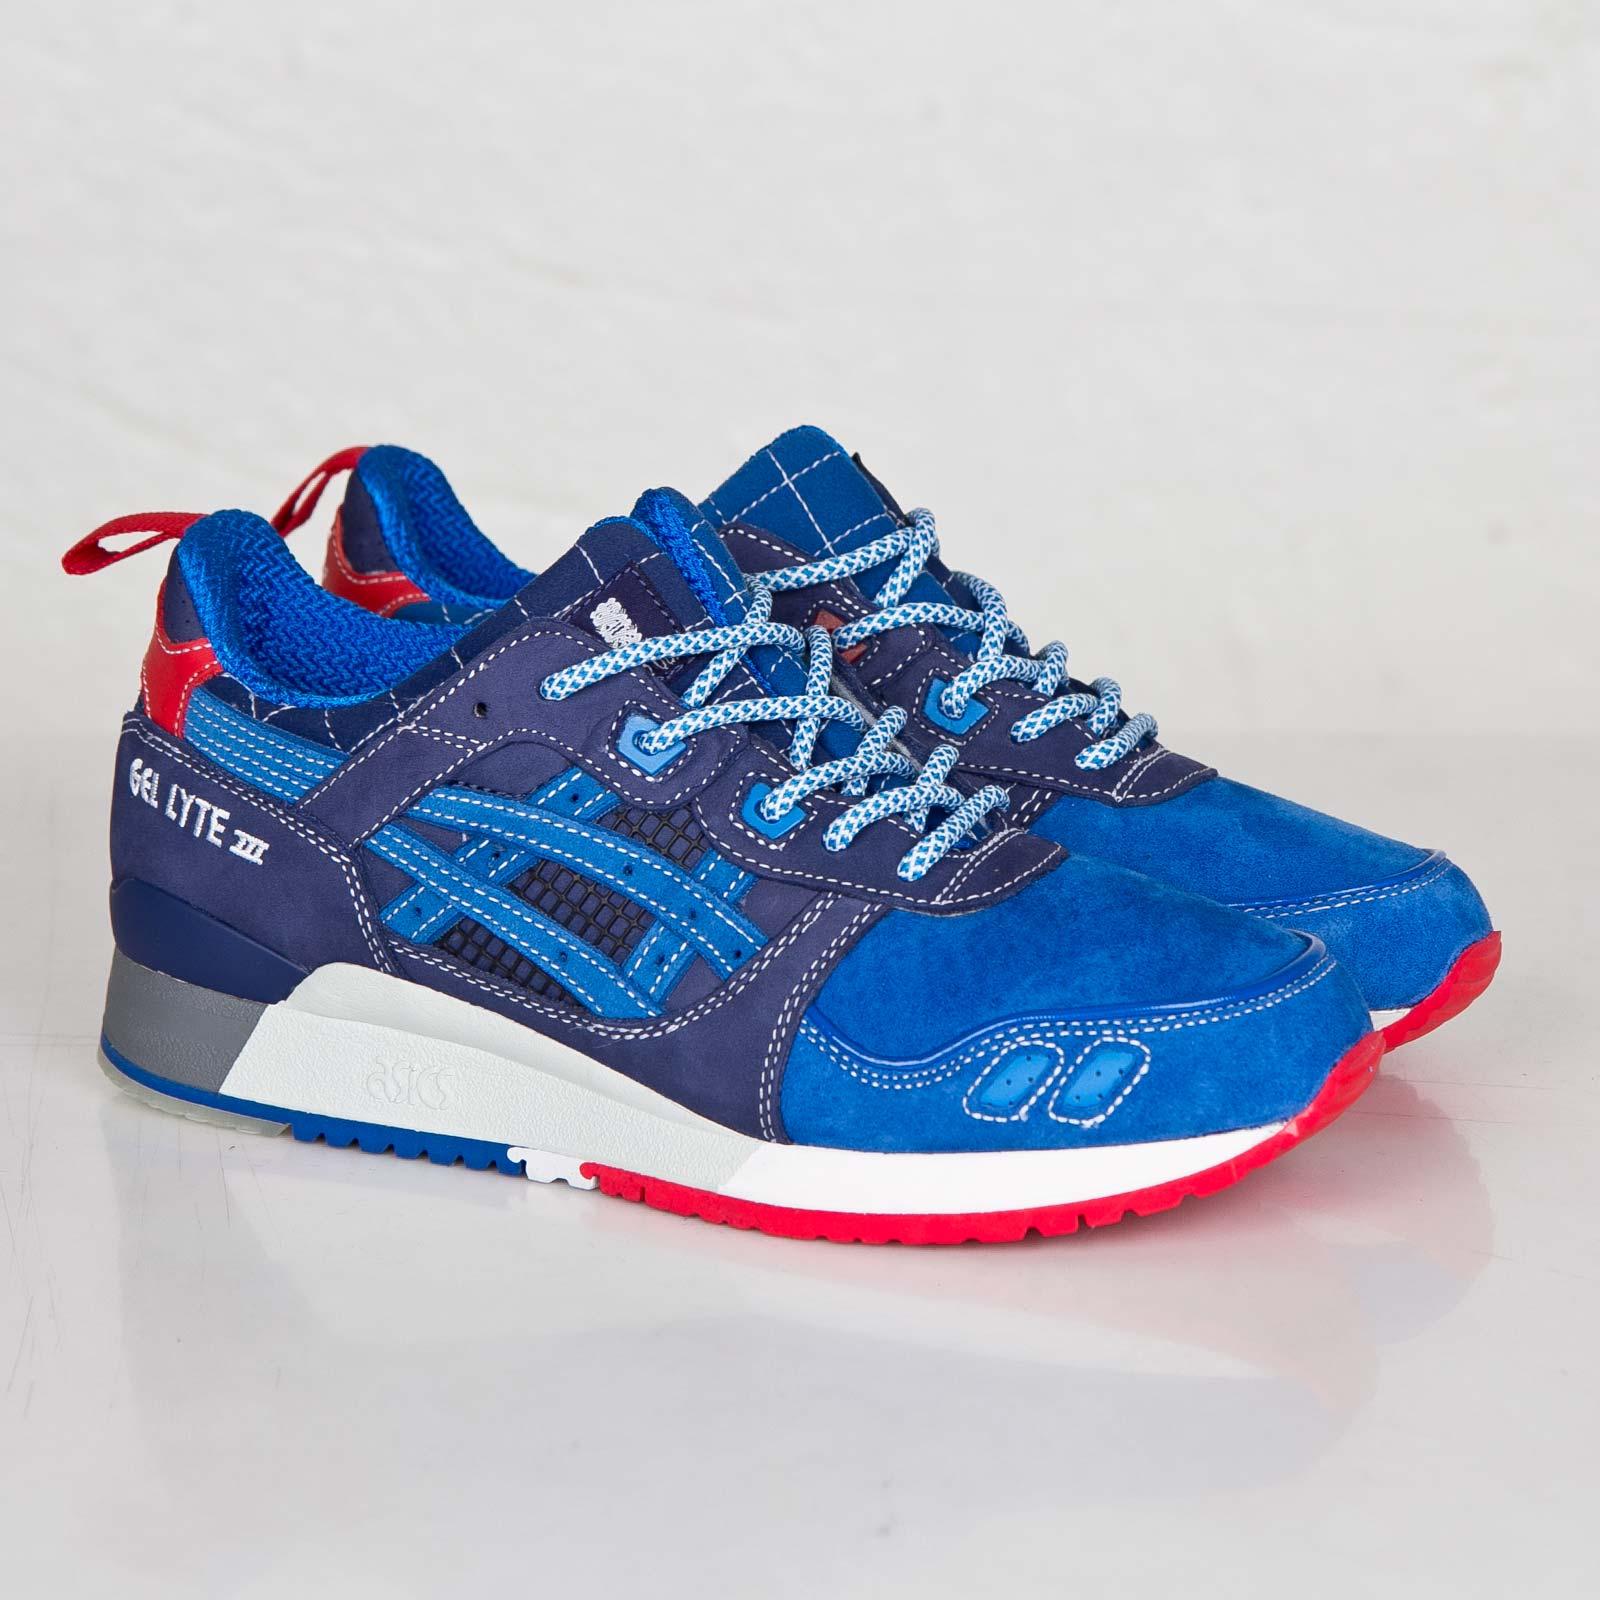 usine authentique f009d 4e4fd ASICS Tiger Gel-Lyte III - H50rk-5042 - Sneakersnstuff ...